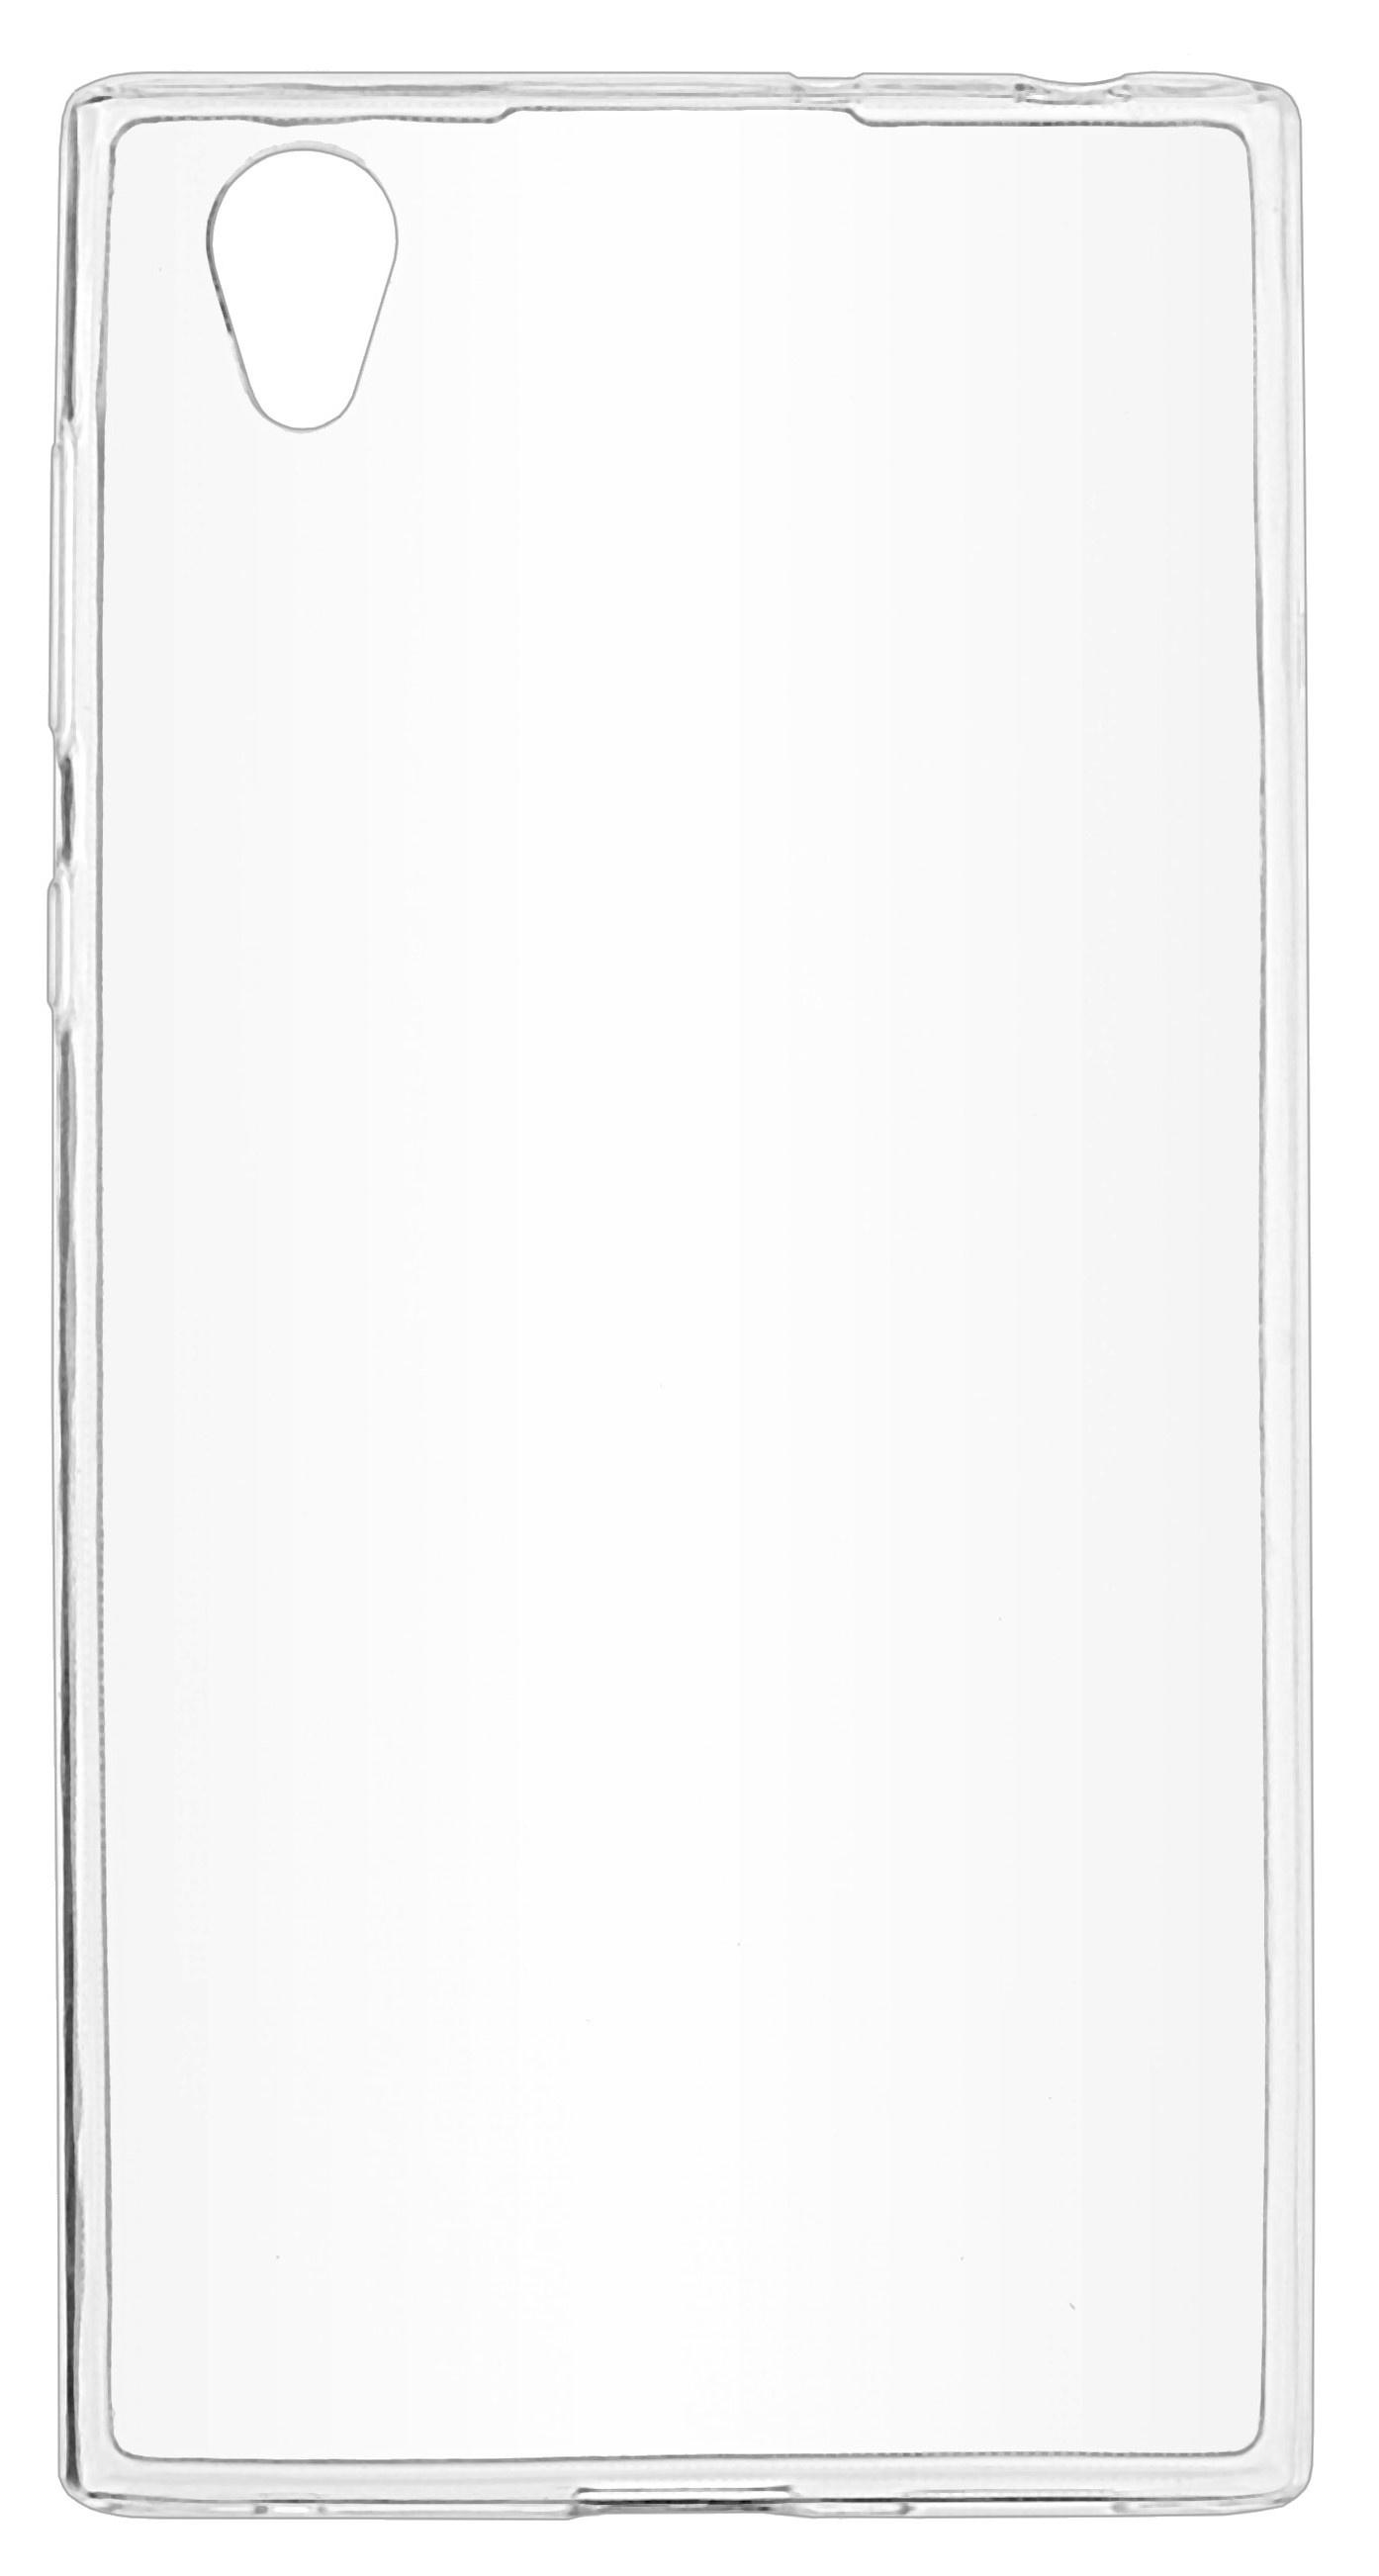 Чехол для сотового телефона skinBOX Slim Silicone, 4660041409109, прозрачный чехол для сотового телефона skinbox slim silicone 4660041408157 прозрачный